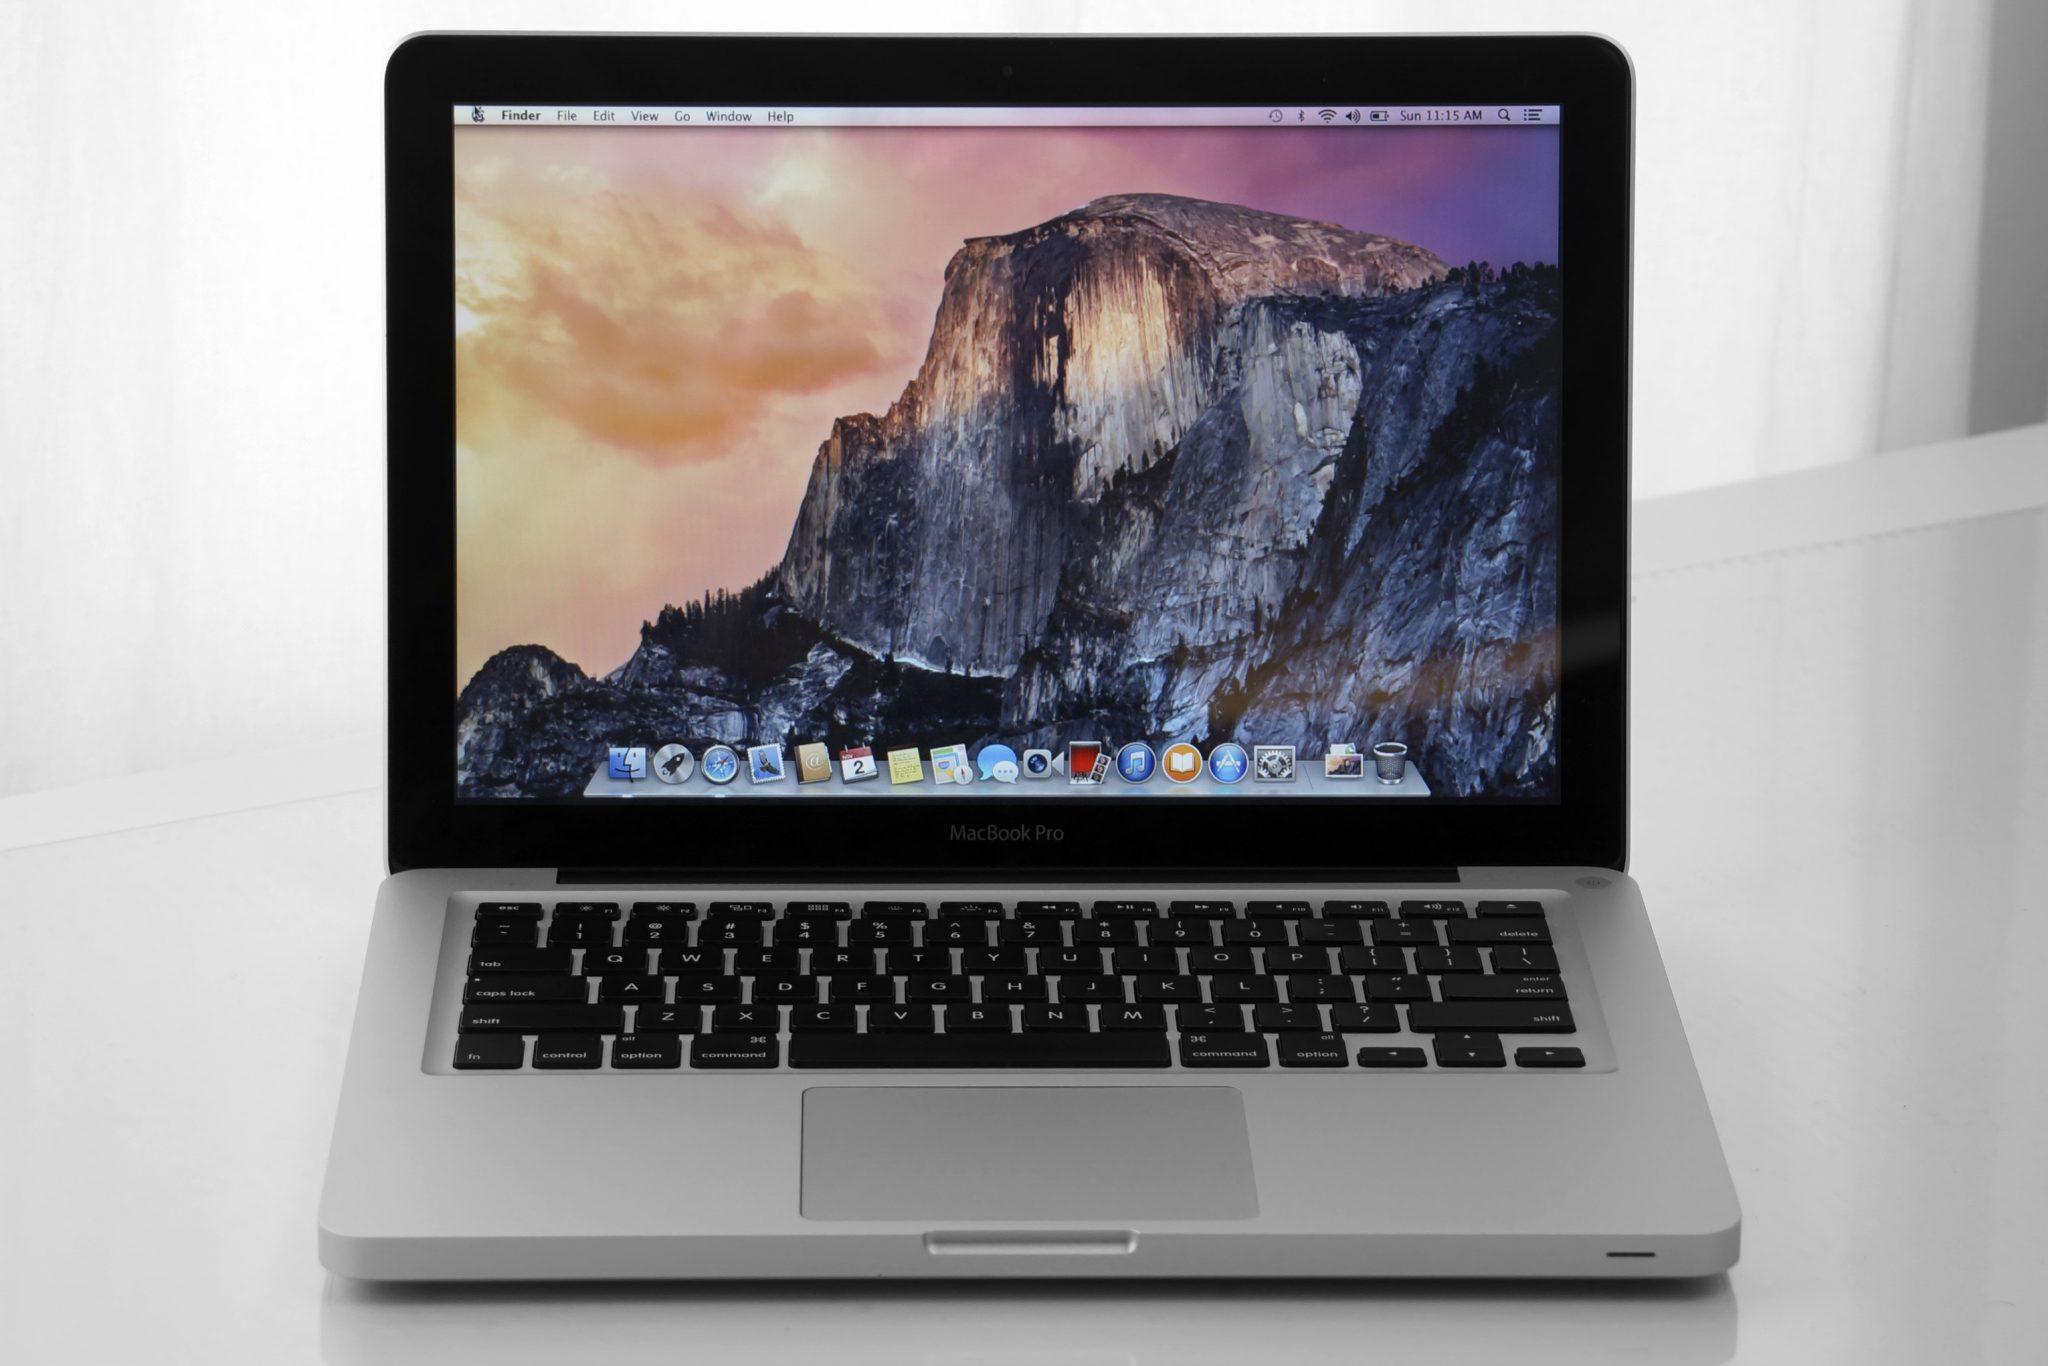 giá macbook pro 2011